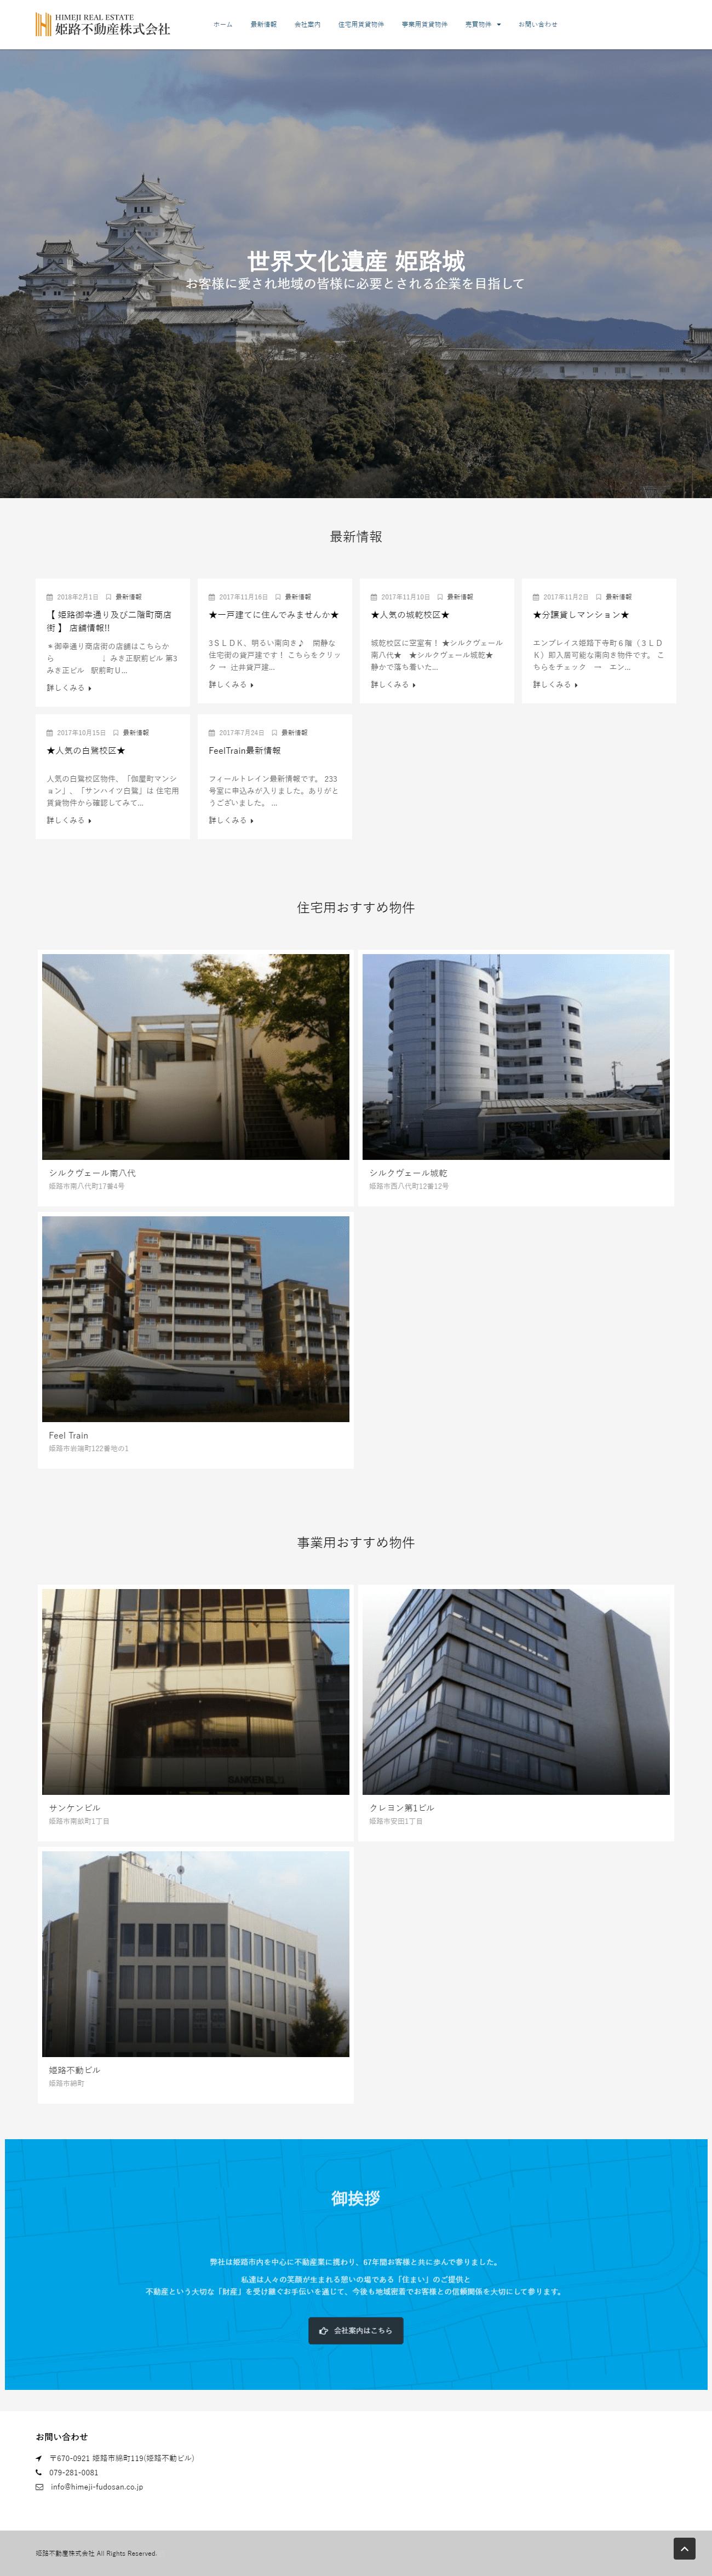 姫路市 姫路不動産株式会社様 ホームページ制作1